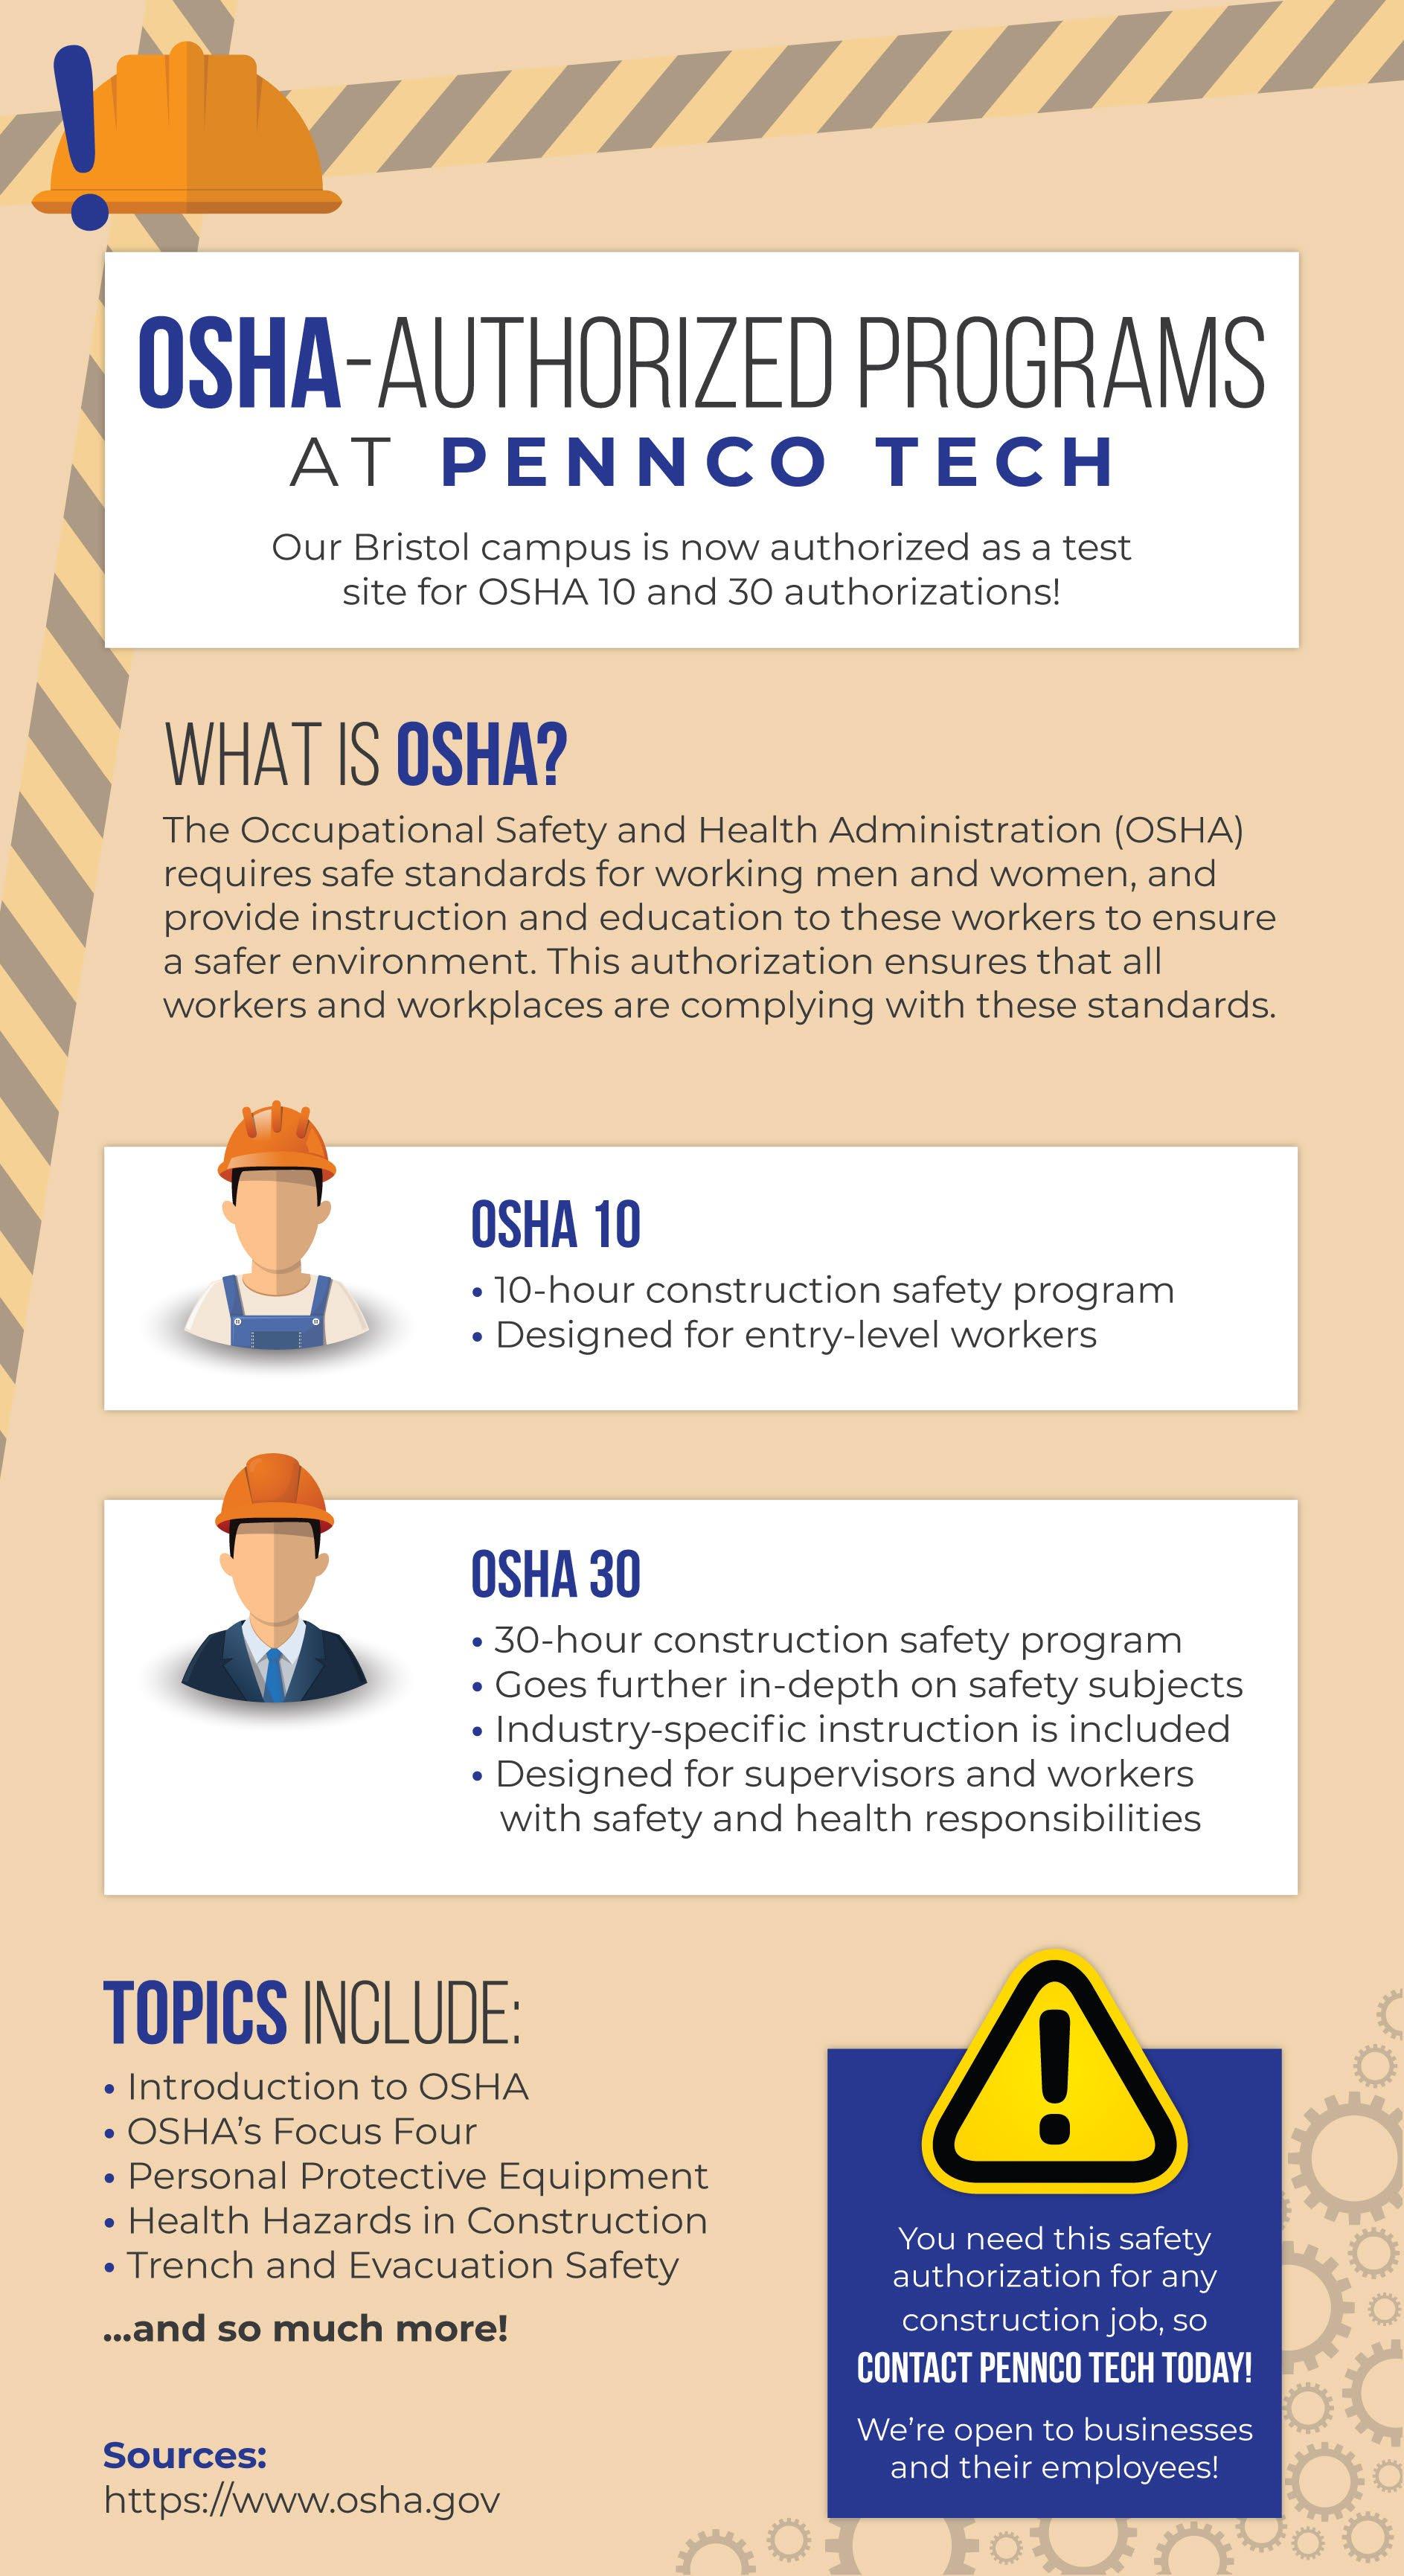 OSHA-Authorized Programs At Pennco Tech